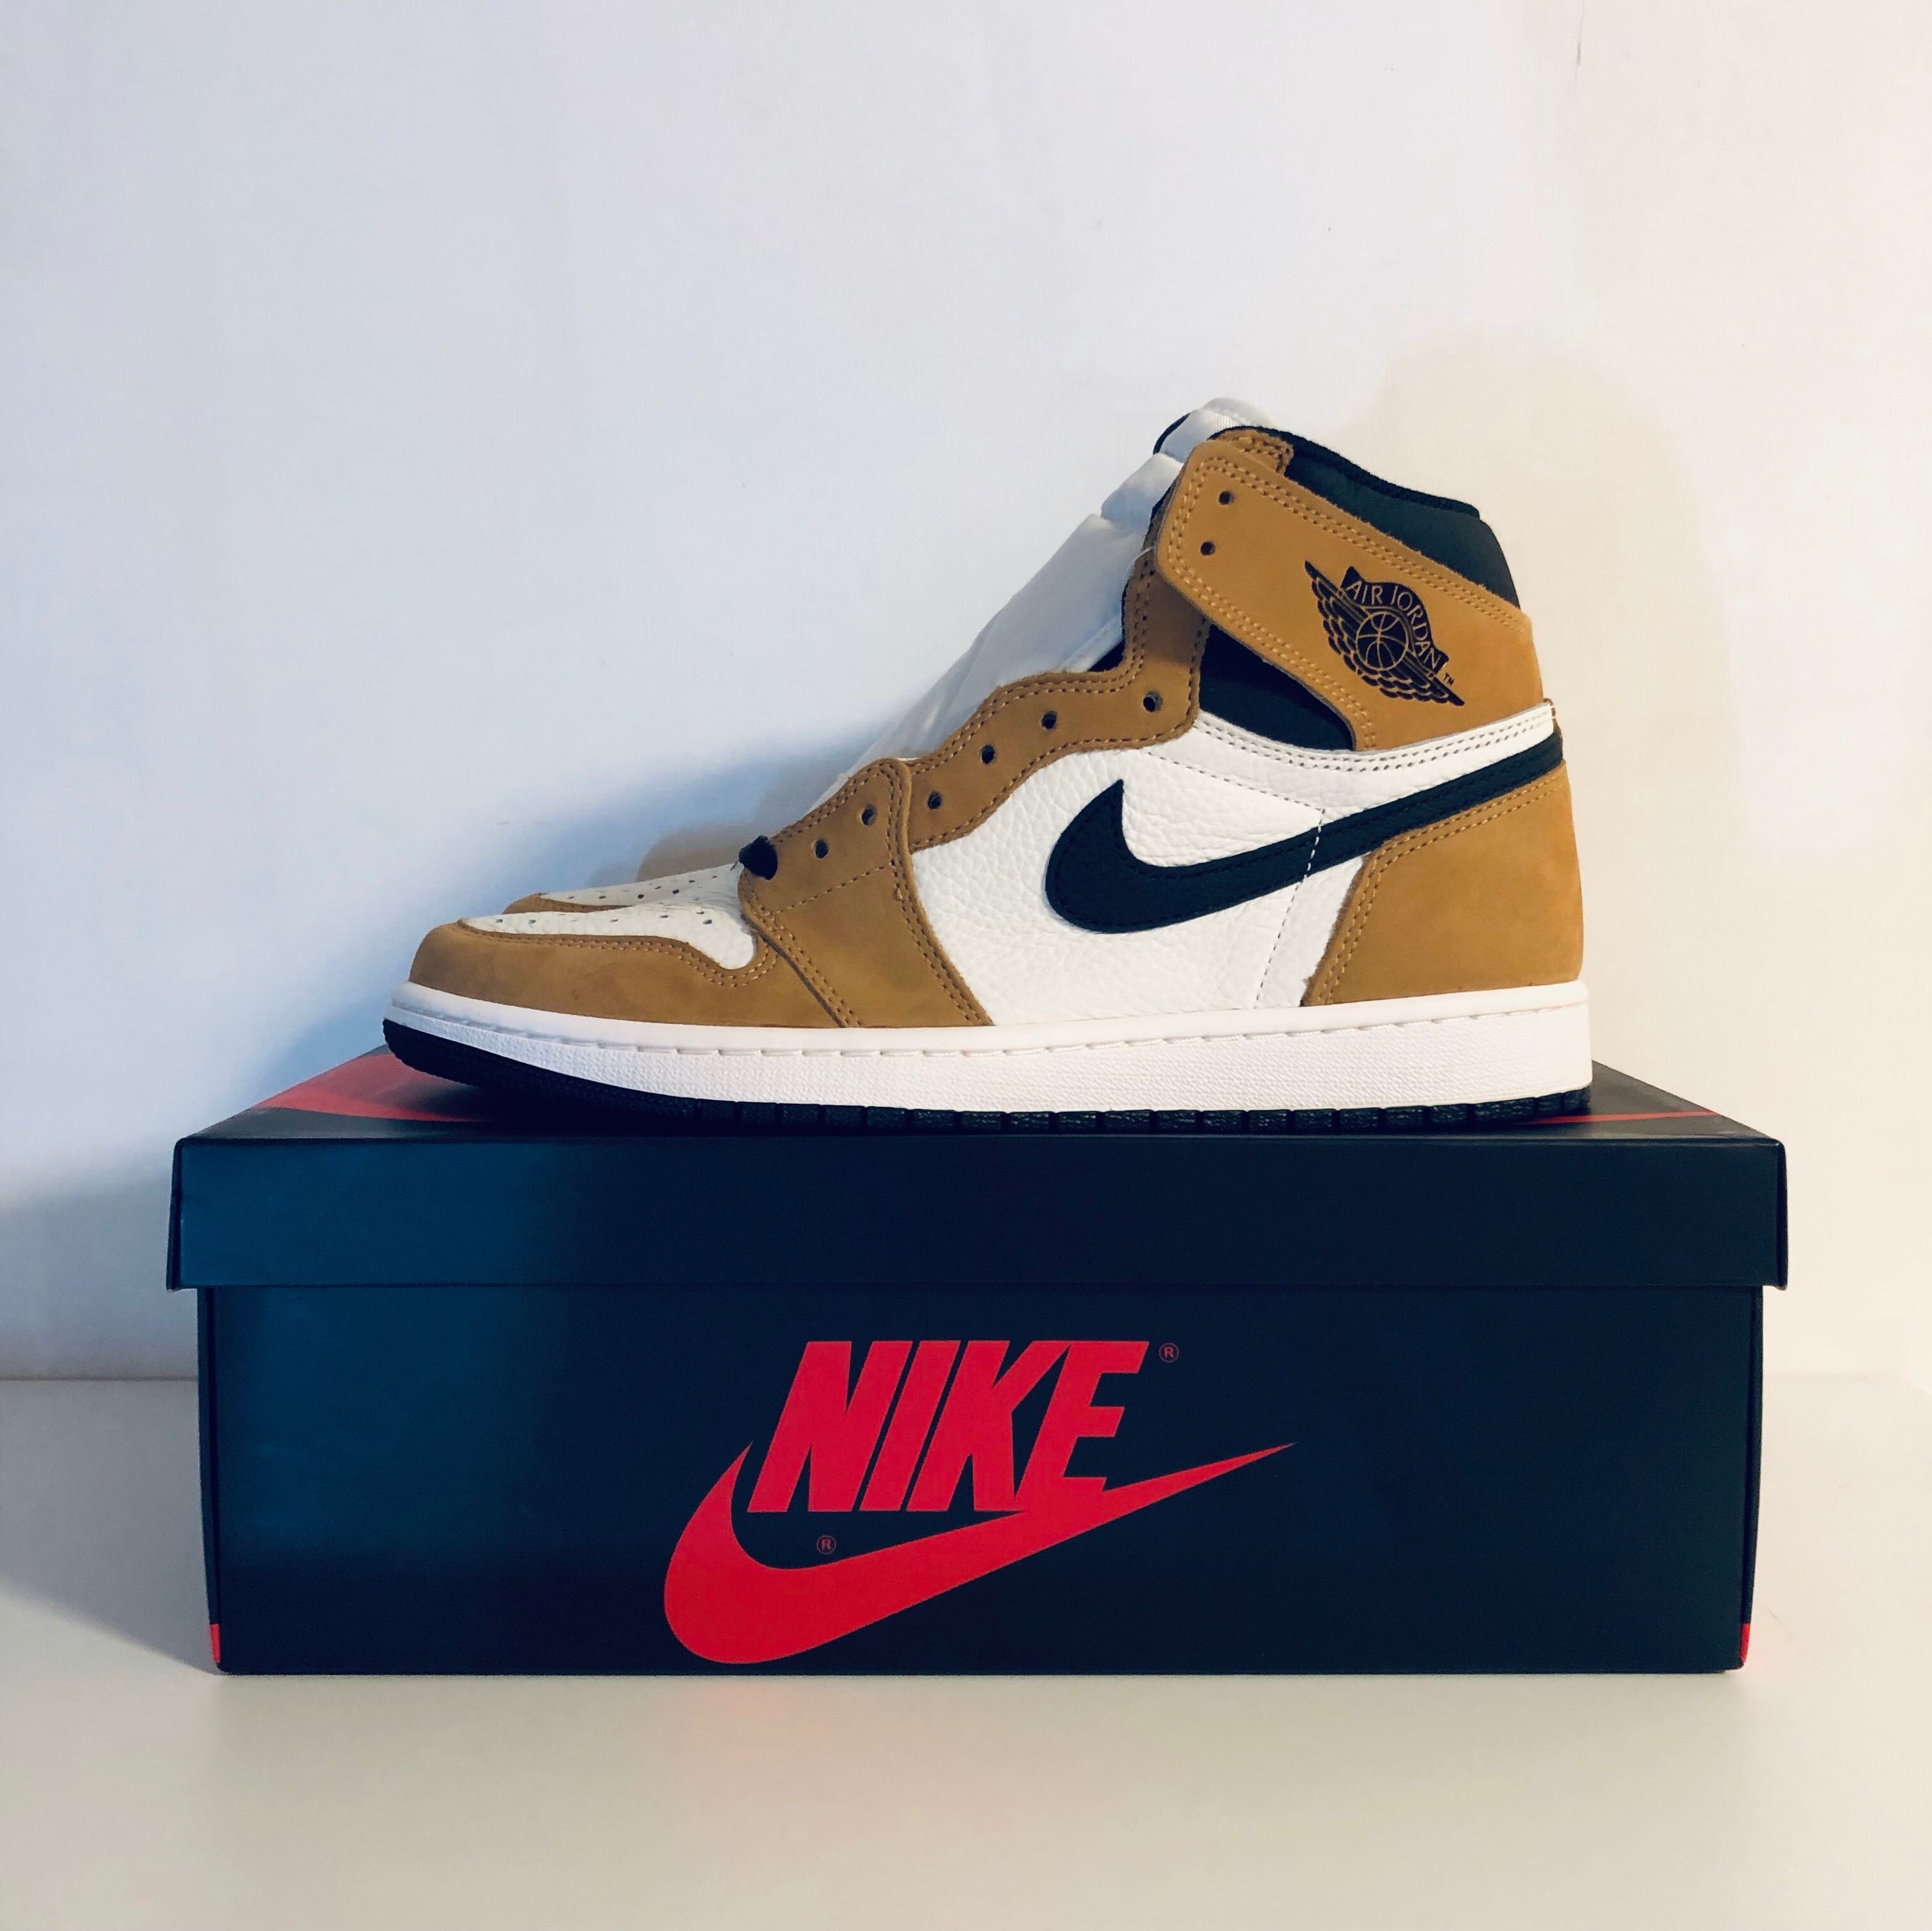 5335a18fd9d639 Nike Air Jordan 1 Rookie Of The Year